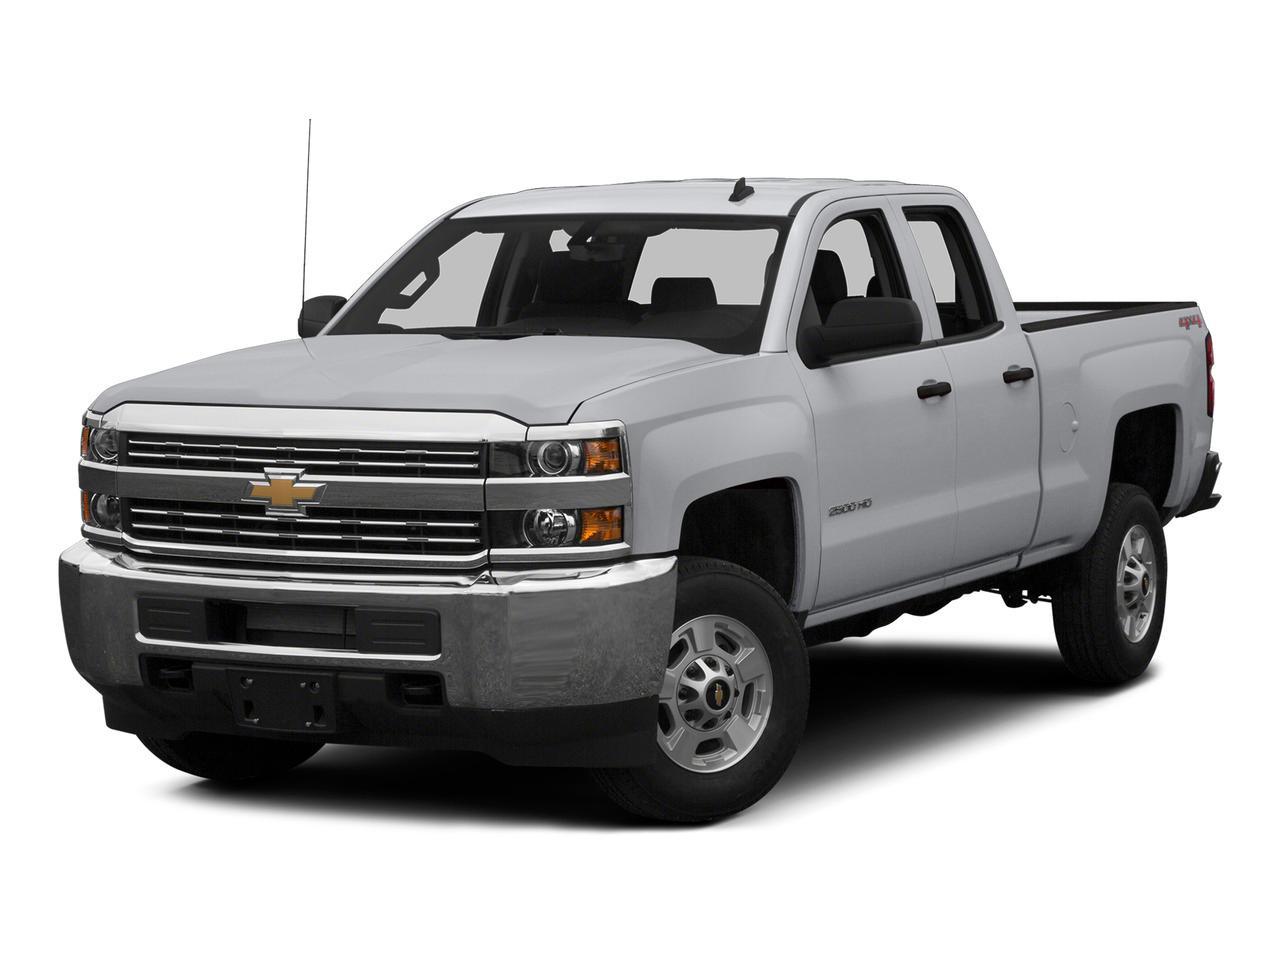 2015 Chevrolet Silverado 2500HD Vehicle Photo in TERRYVILLE, CT 06786-5904